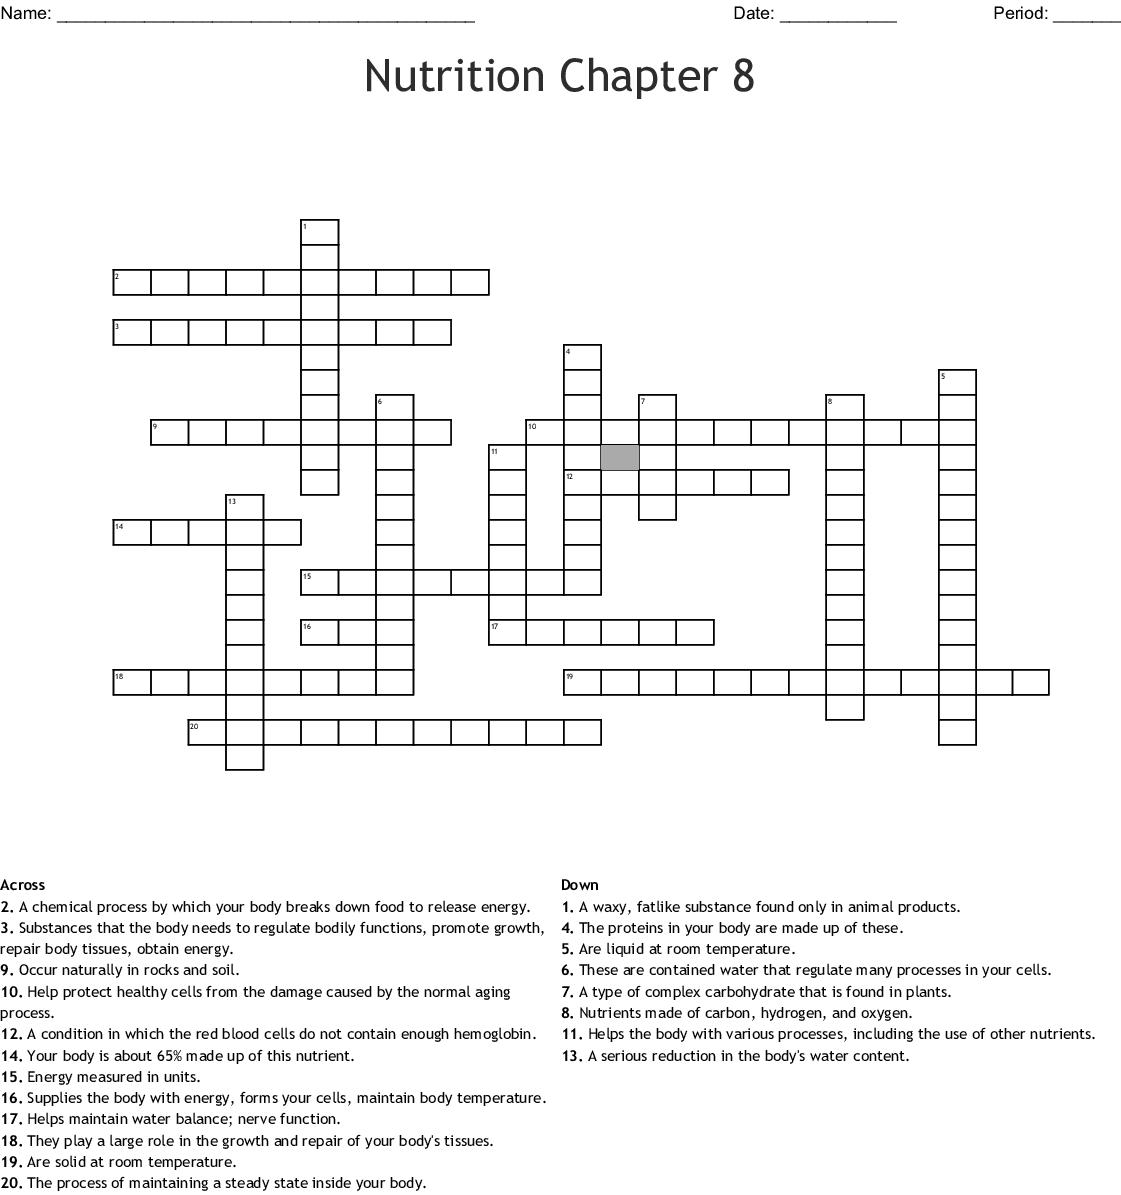 Nutrition Chapter 8 Crossword